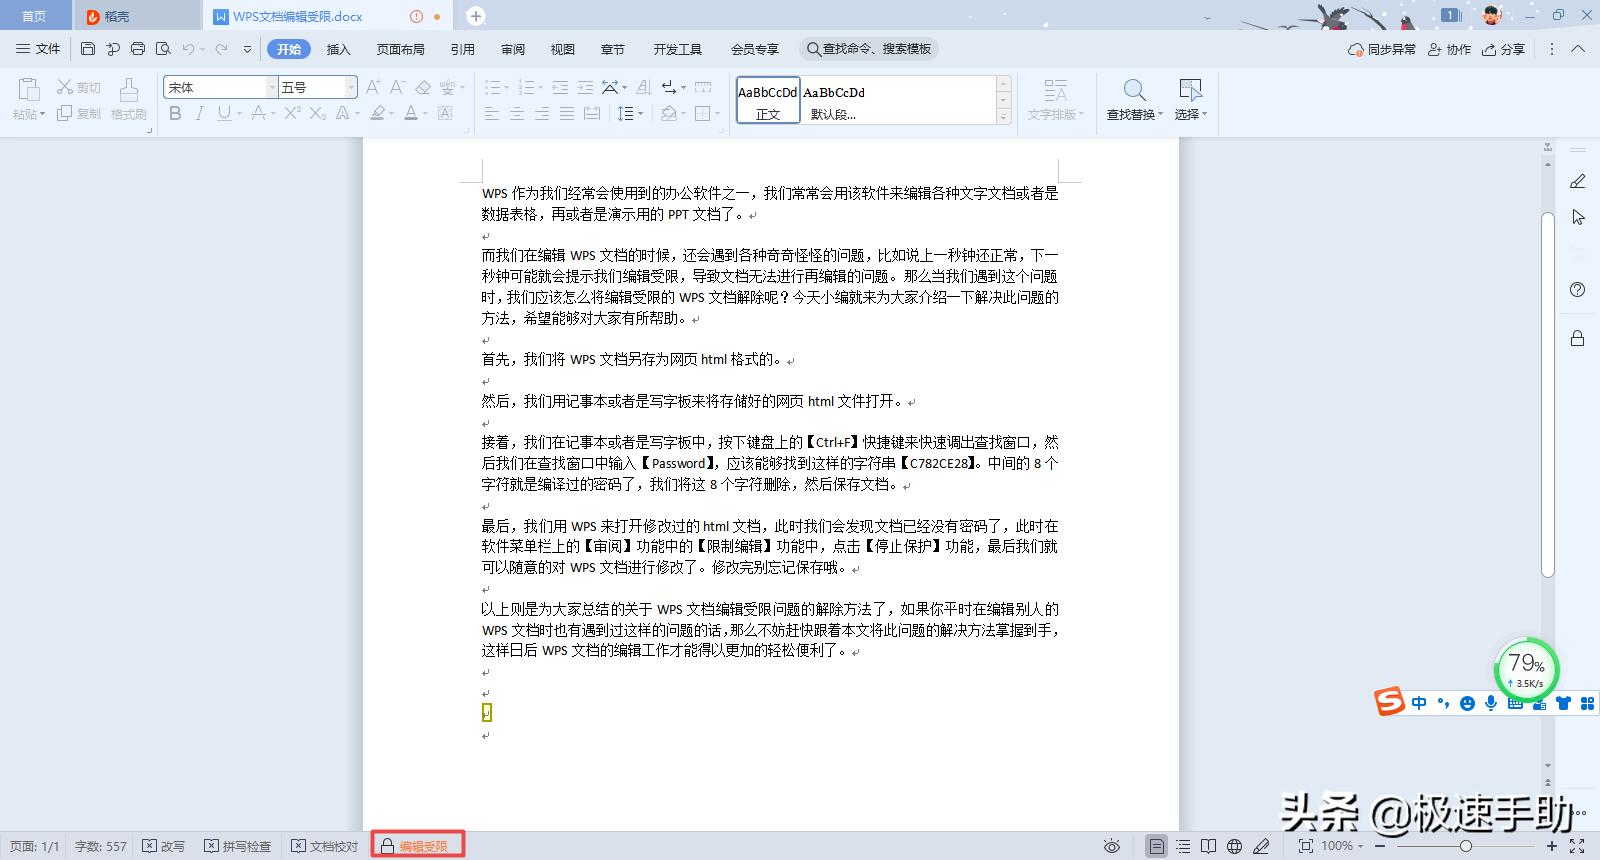 WPS文档编辑受限怎么解除?一招帮你轻松解决它